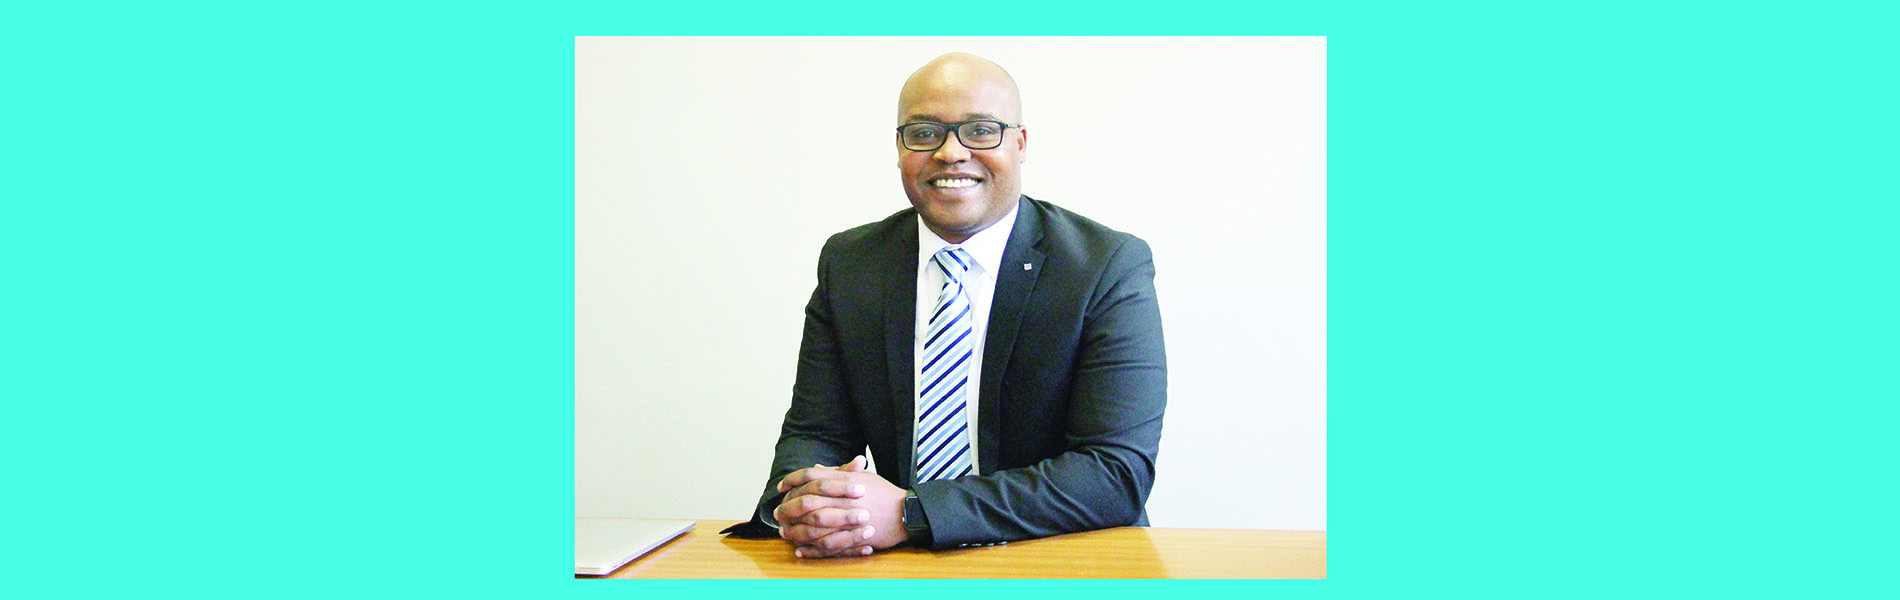 Christo Nicholls holder of new Stellenbosch University Utility Solutions Research Chair